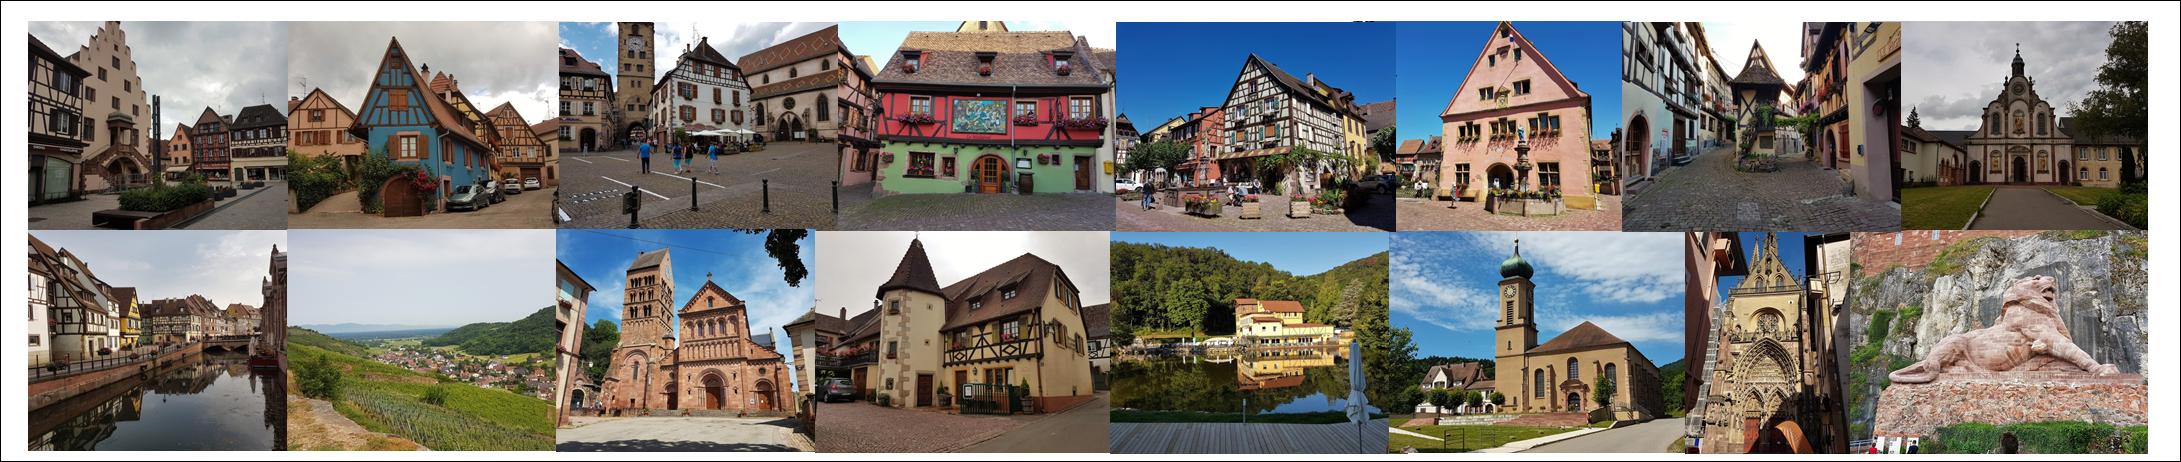 Sélestat, St Hypolite, Ribeauvillé, Riquewhir, Kaysersberg, Turckeim, Colmar, Eguisheim, Guebwiller, Wattwiller, Than, Bellemagny, Belfort.